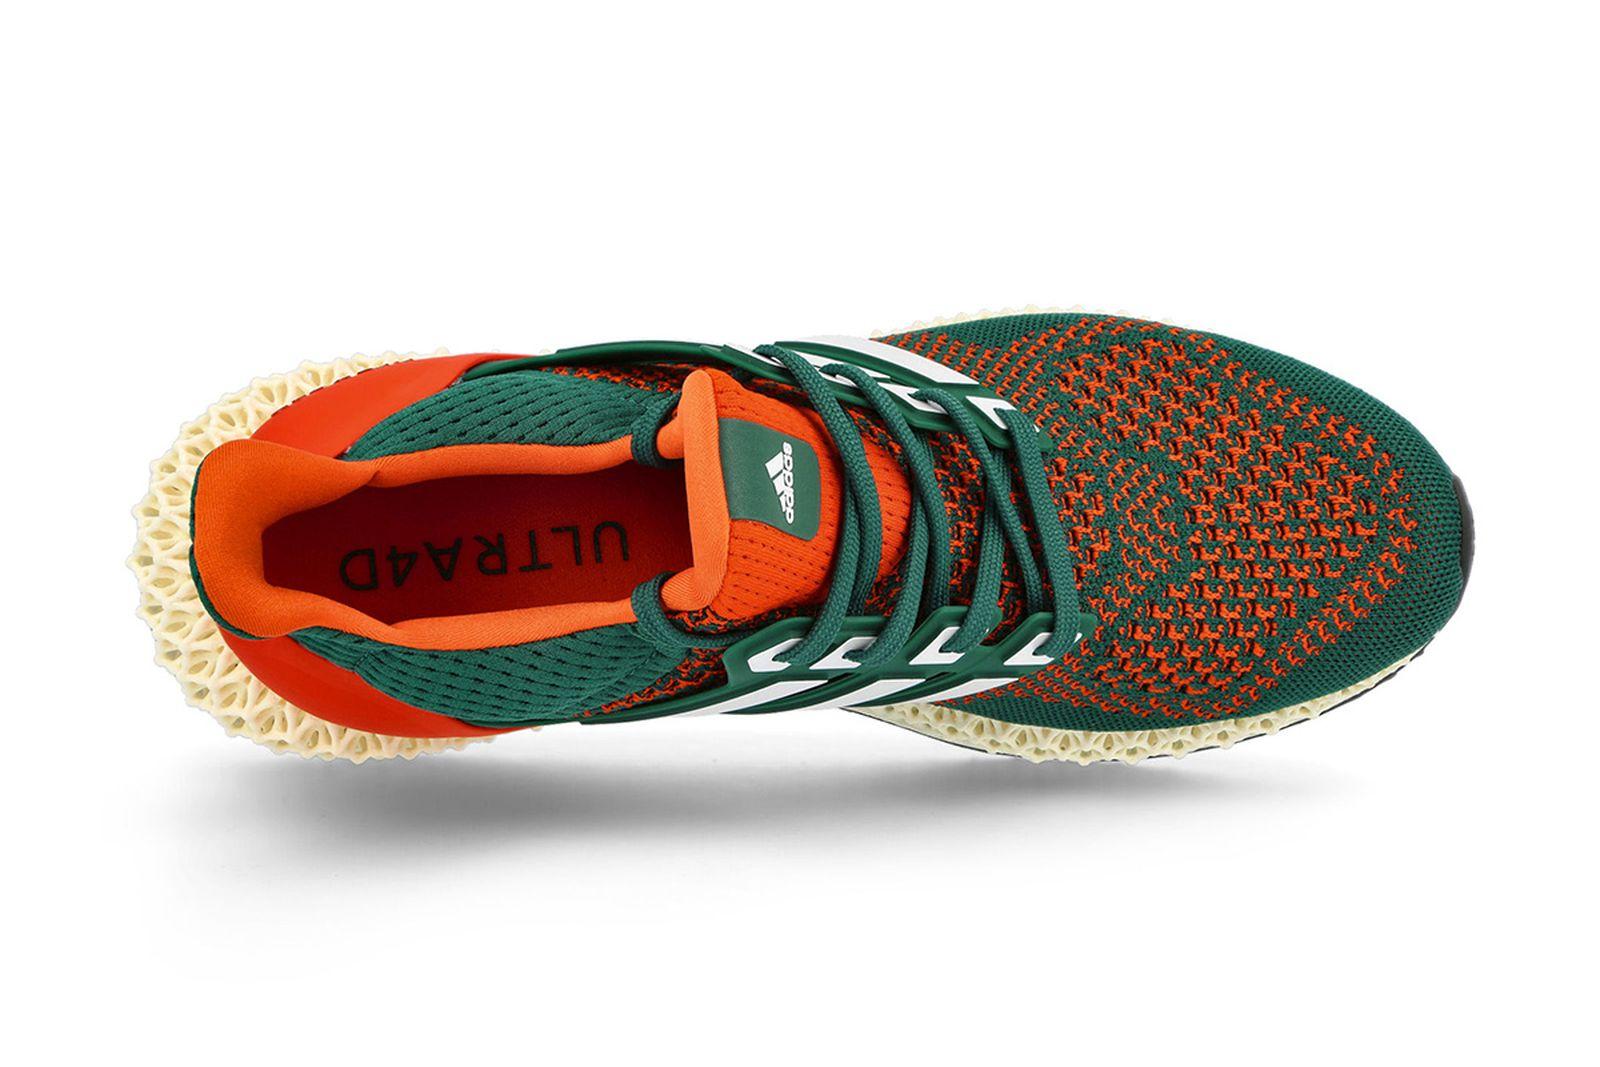 adidas-ultra4d-miami-release-date-price-02